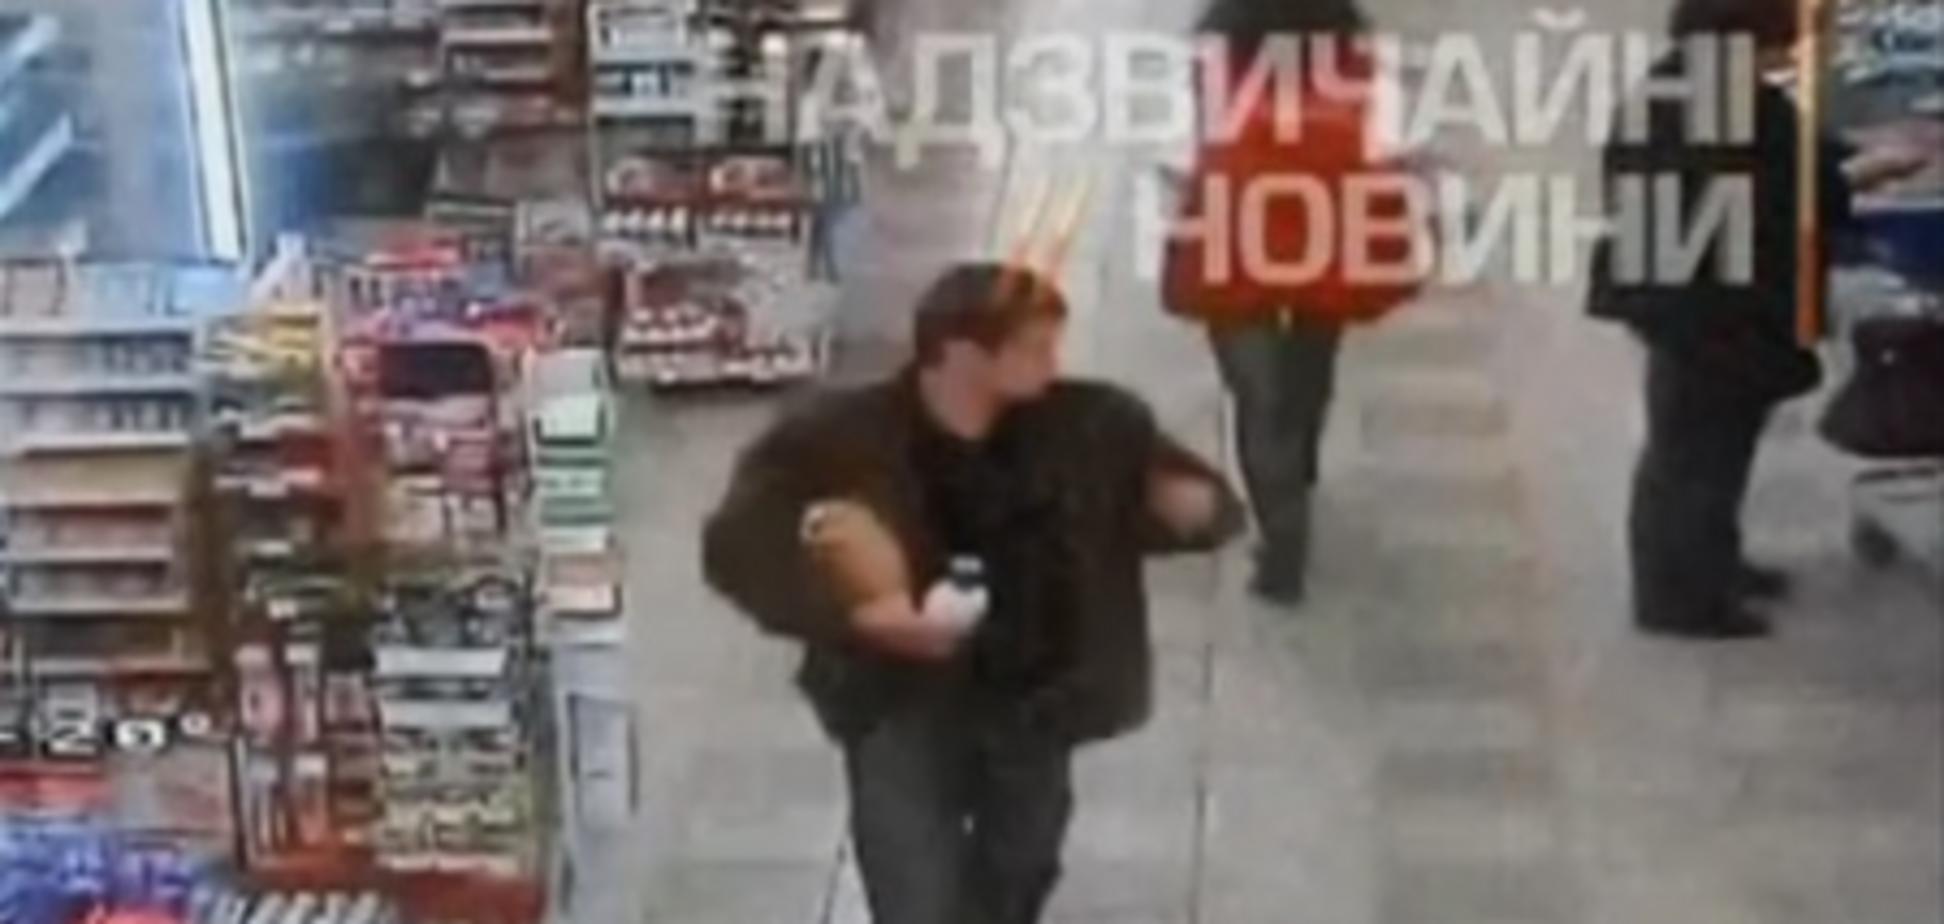 Обнародовано видео бойни в комнате охраны в 'Караване'